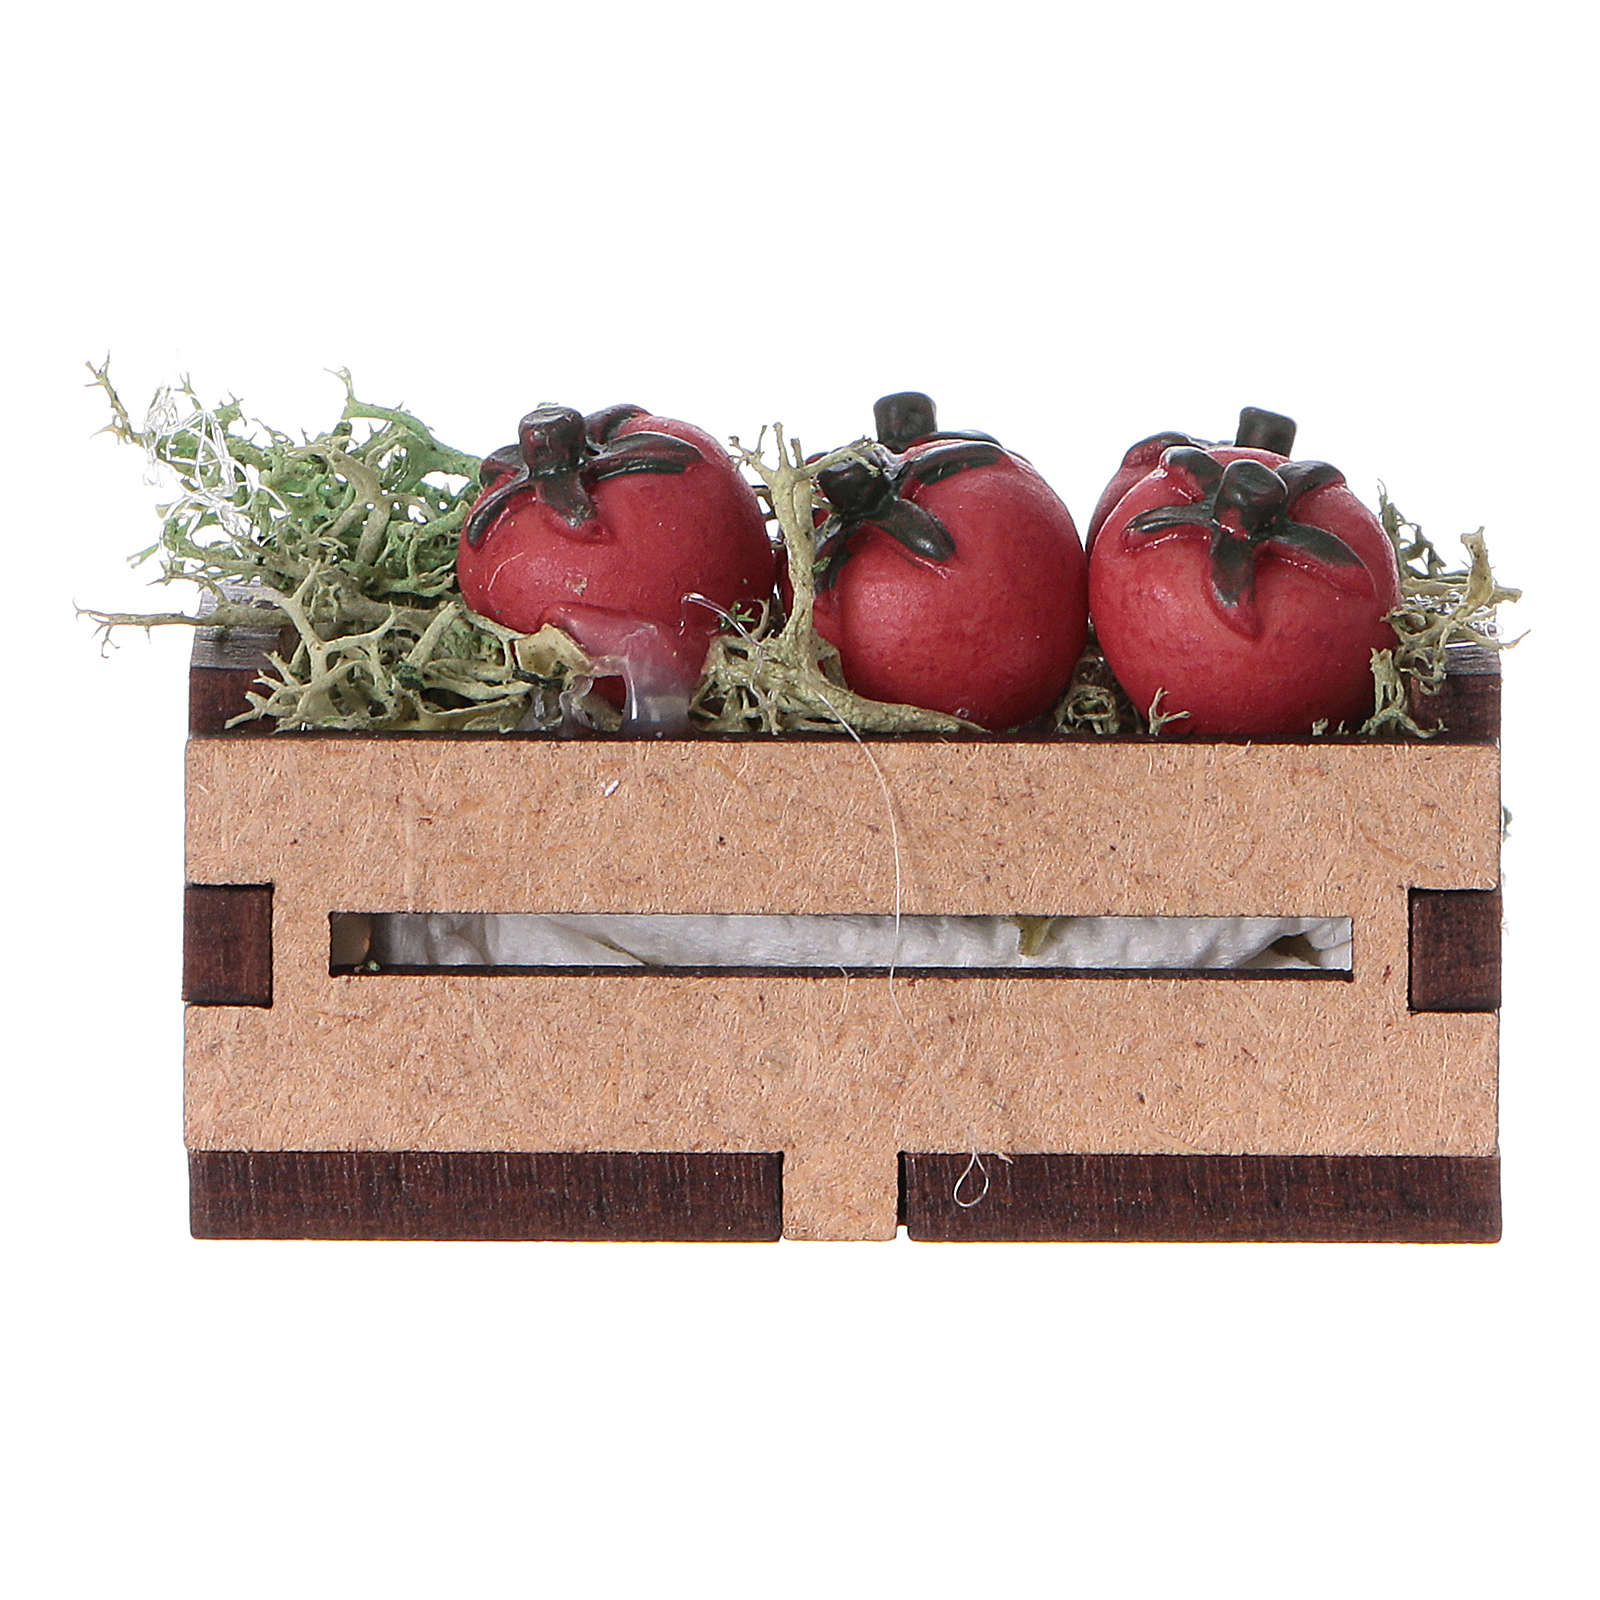 Case of tomatoes 5x5x5 cm 4